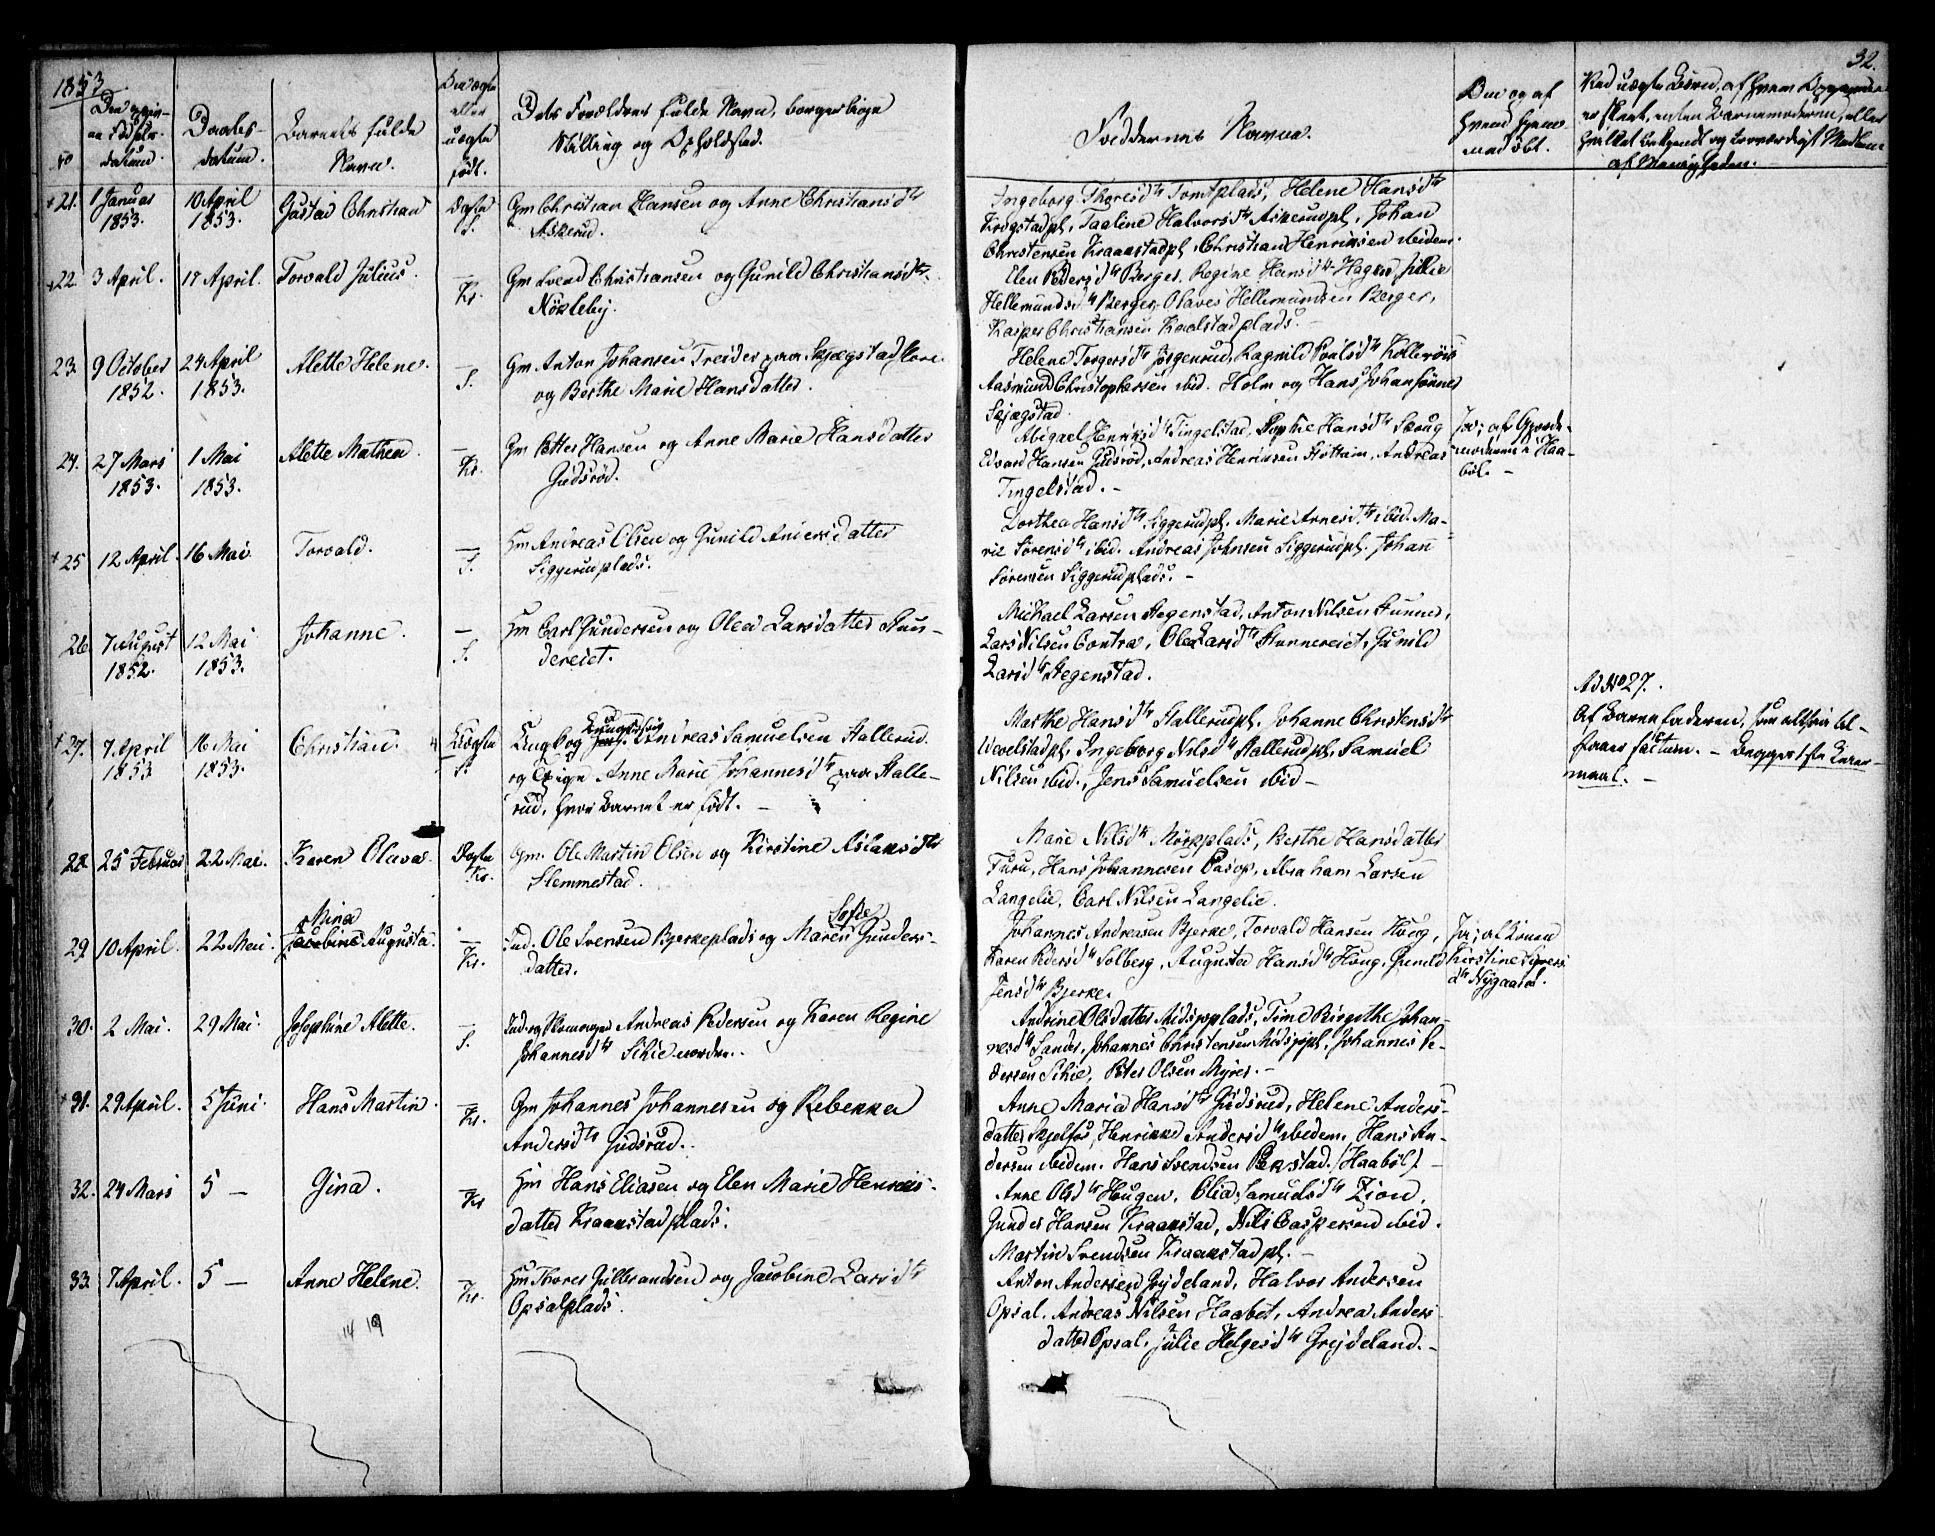 SAO, Kråkstad prestekontor Kirkebøker, F/Fa/L0006: Ministerialbok nr. I 6, 1848-1857, s. 32